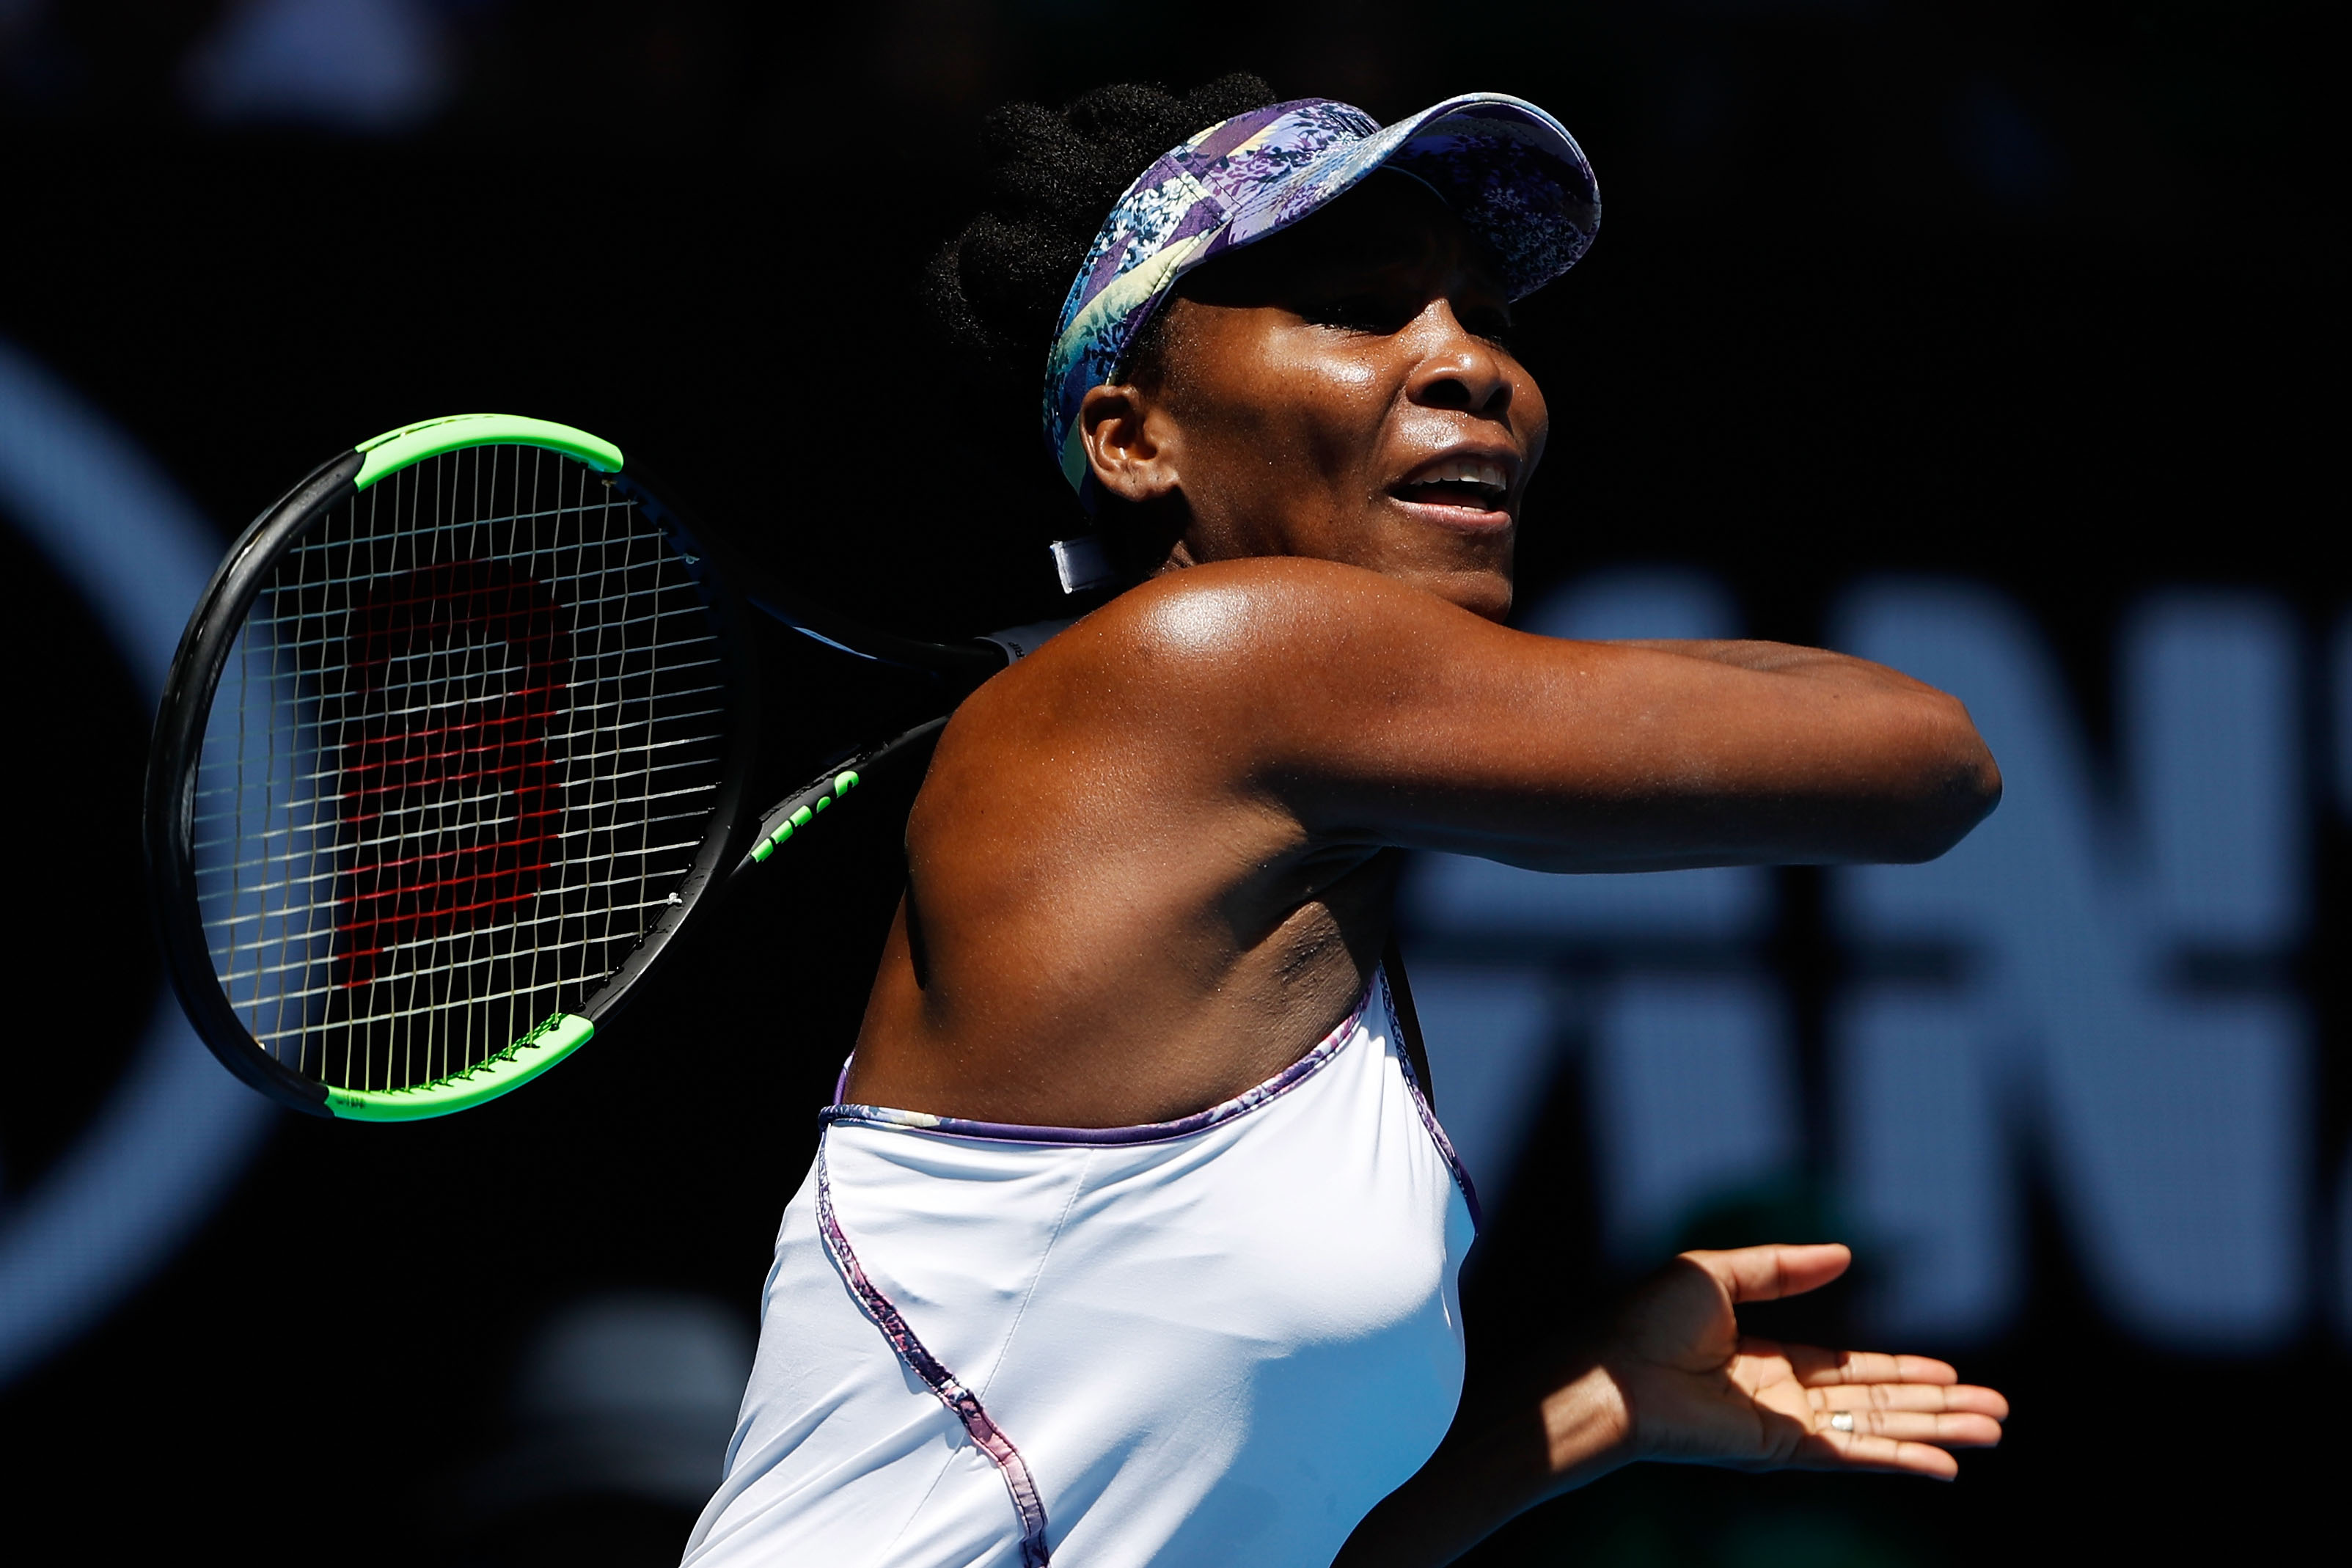 Venus Williams moves past Anastasia Pavlyuchenkova to reach Australian Open semi-final